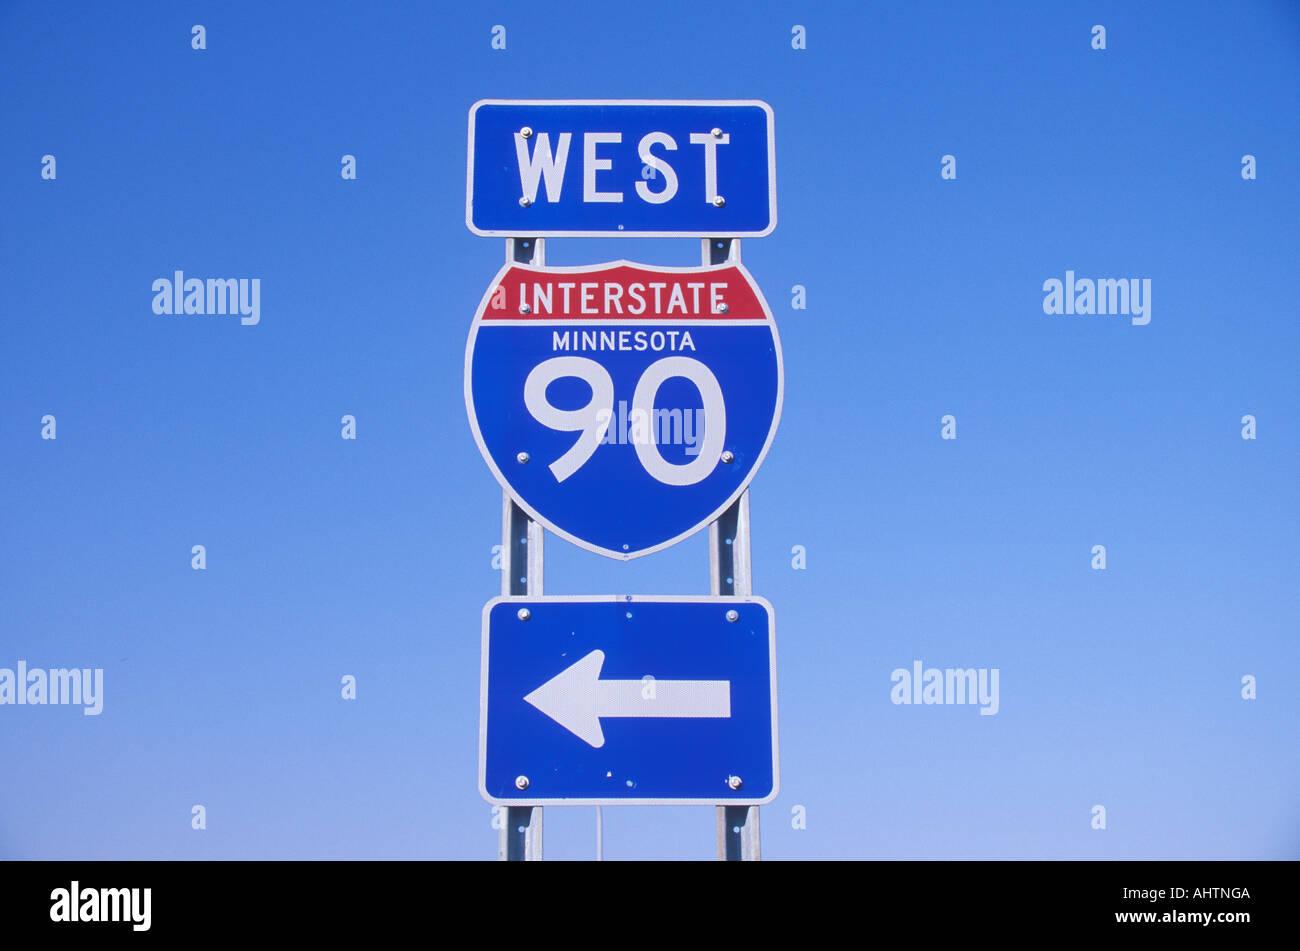 Minnesota Highway Sign Stock Photos Minnesota Highway Sign Stock - Us-interstate-90-map